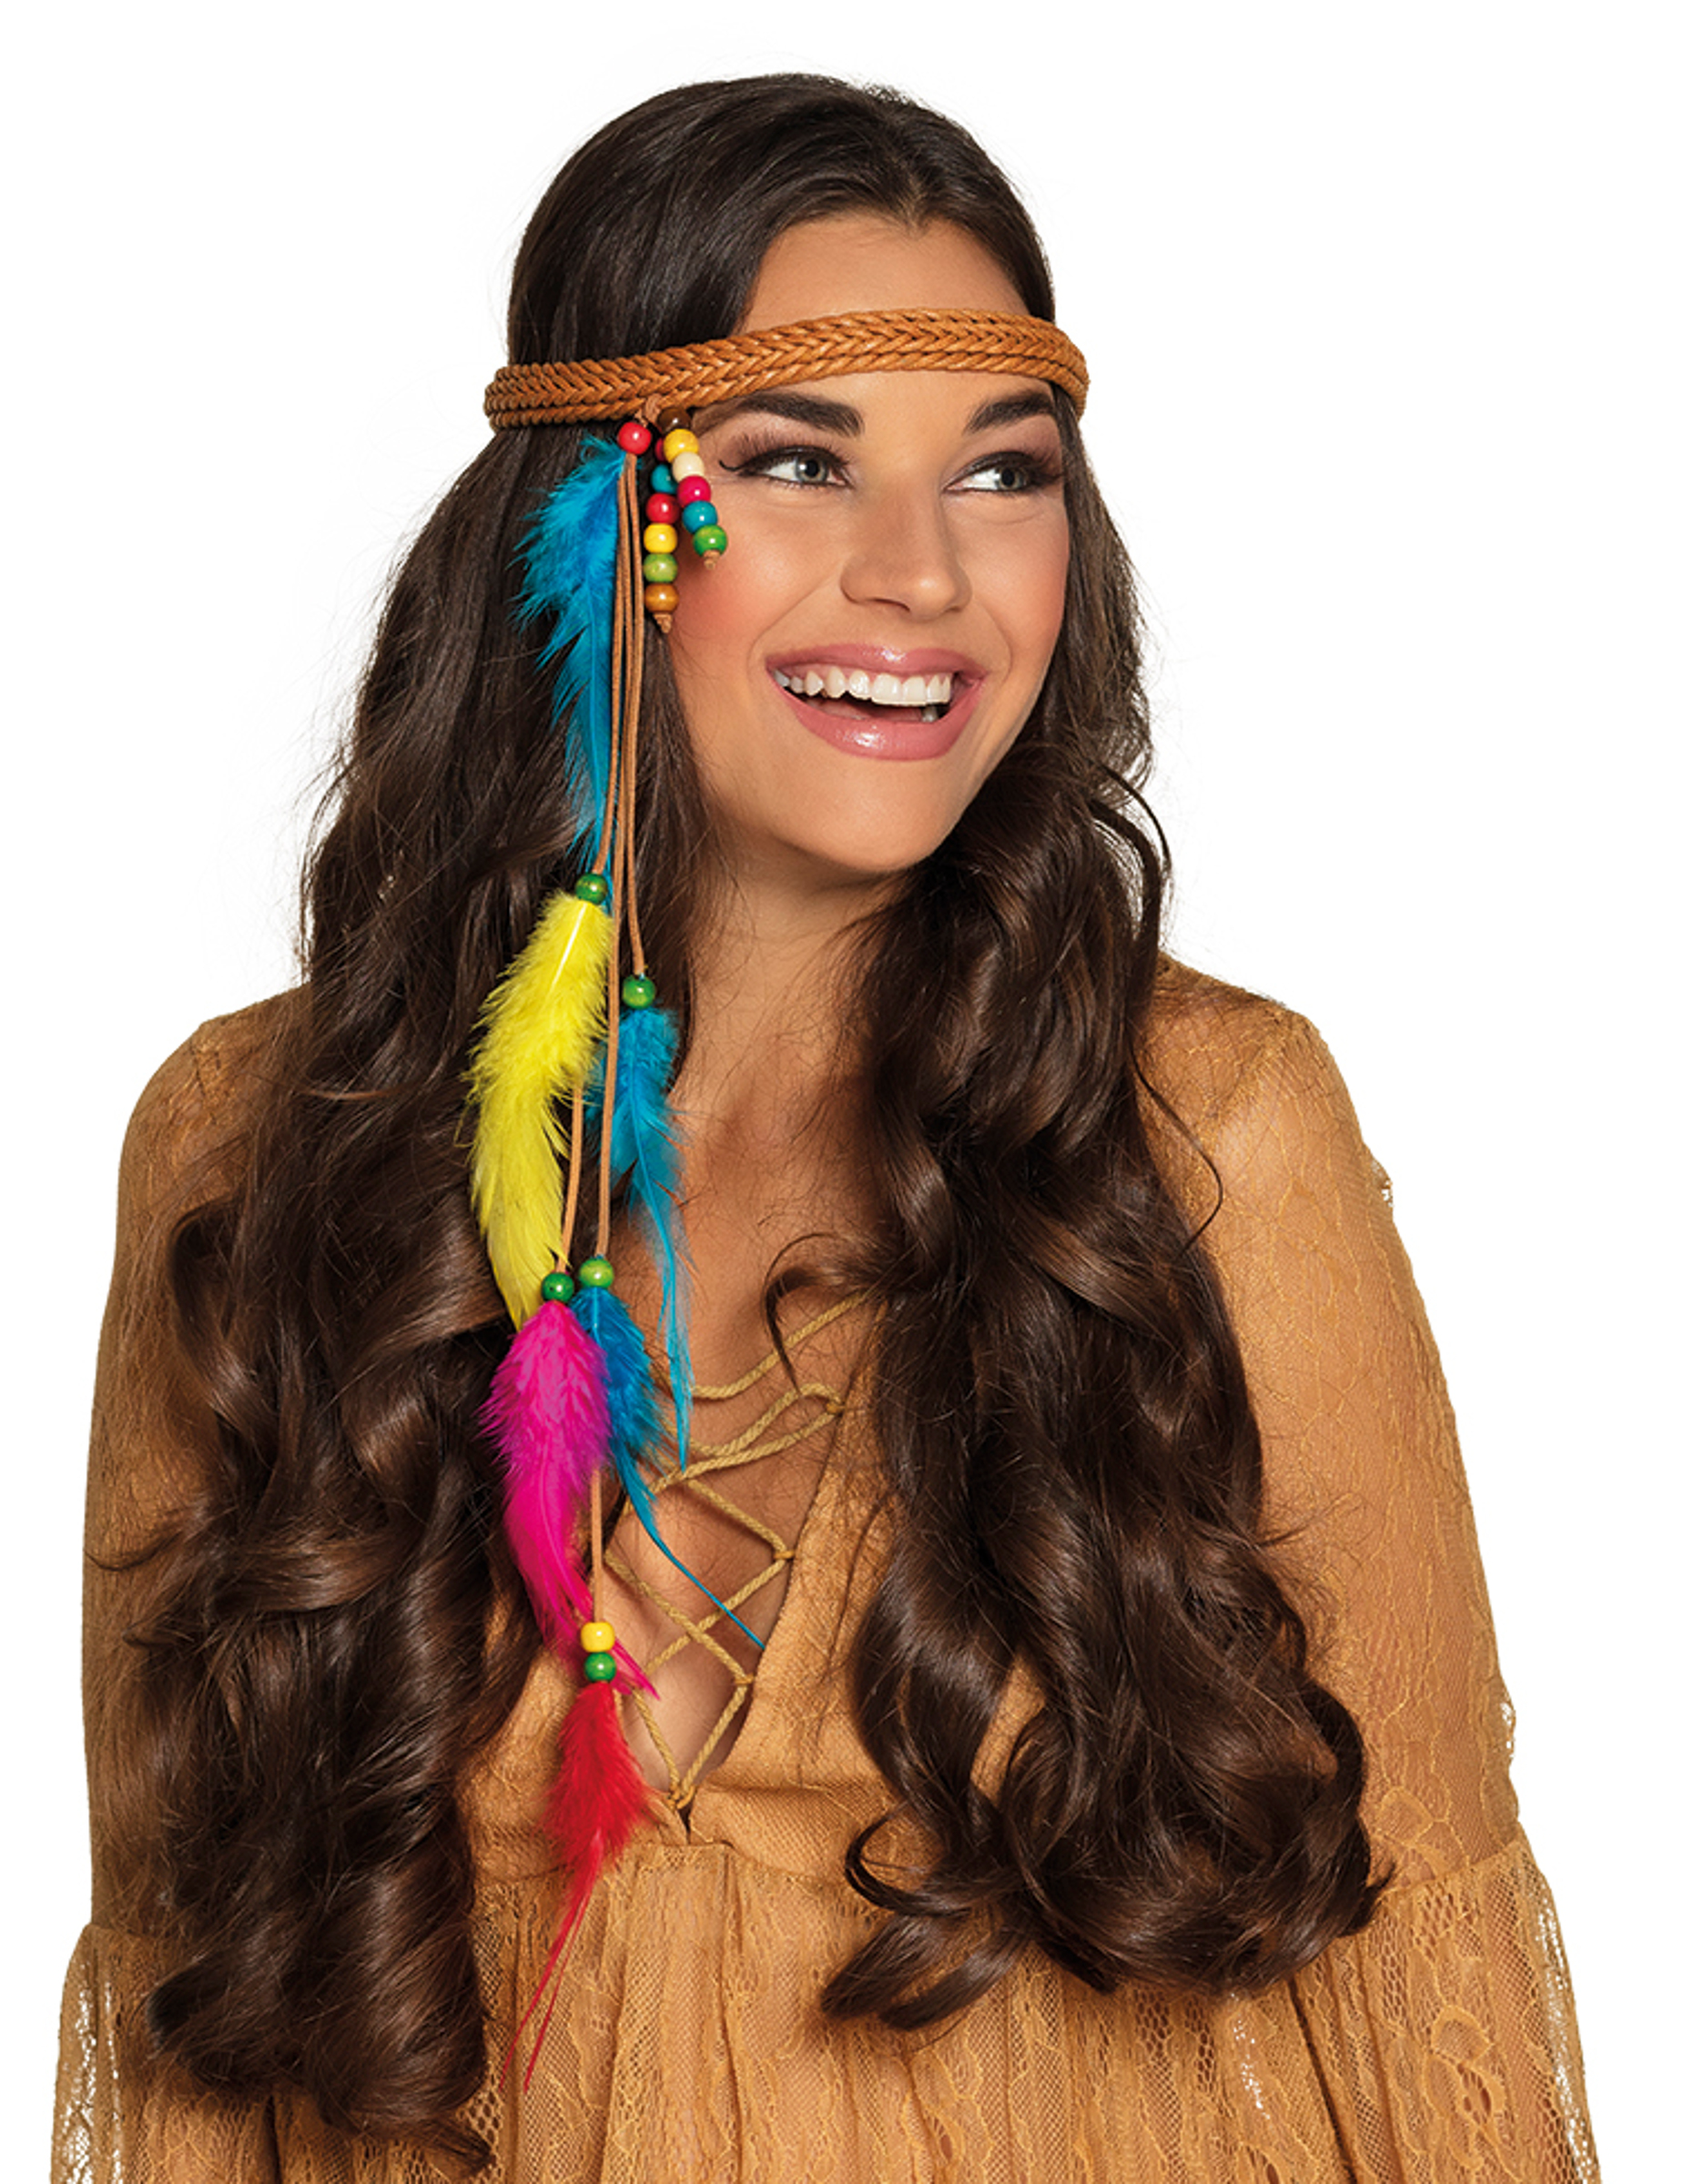 indianer stirnband mit federn braun bunt g nstige faschings accessoires zubeh r bei karneval. Black Bedroom Furniture Sets. Home Design Ideas